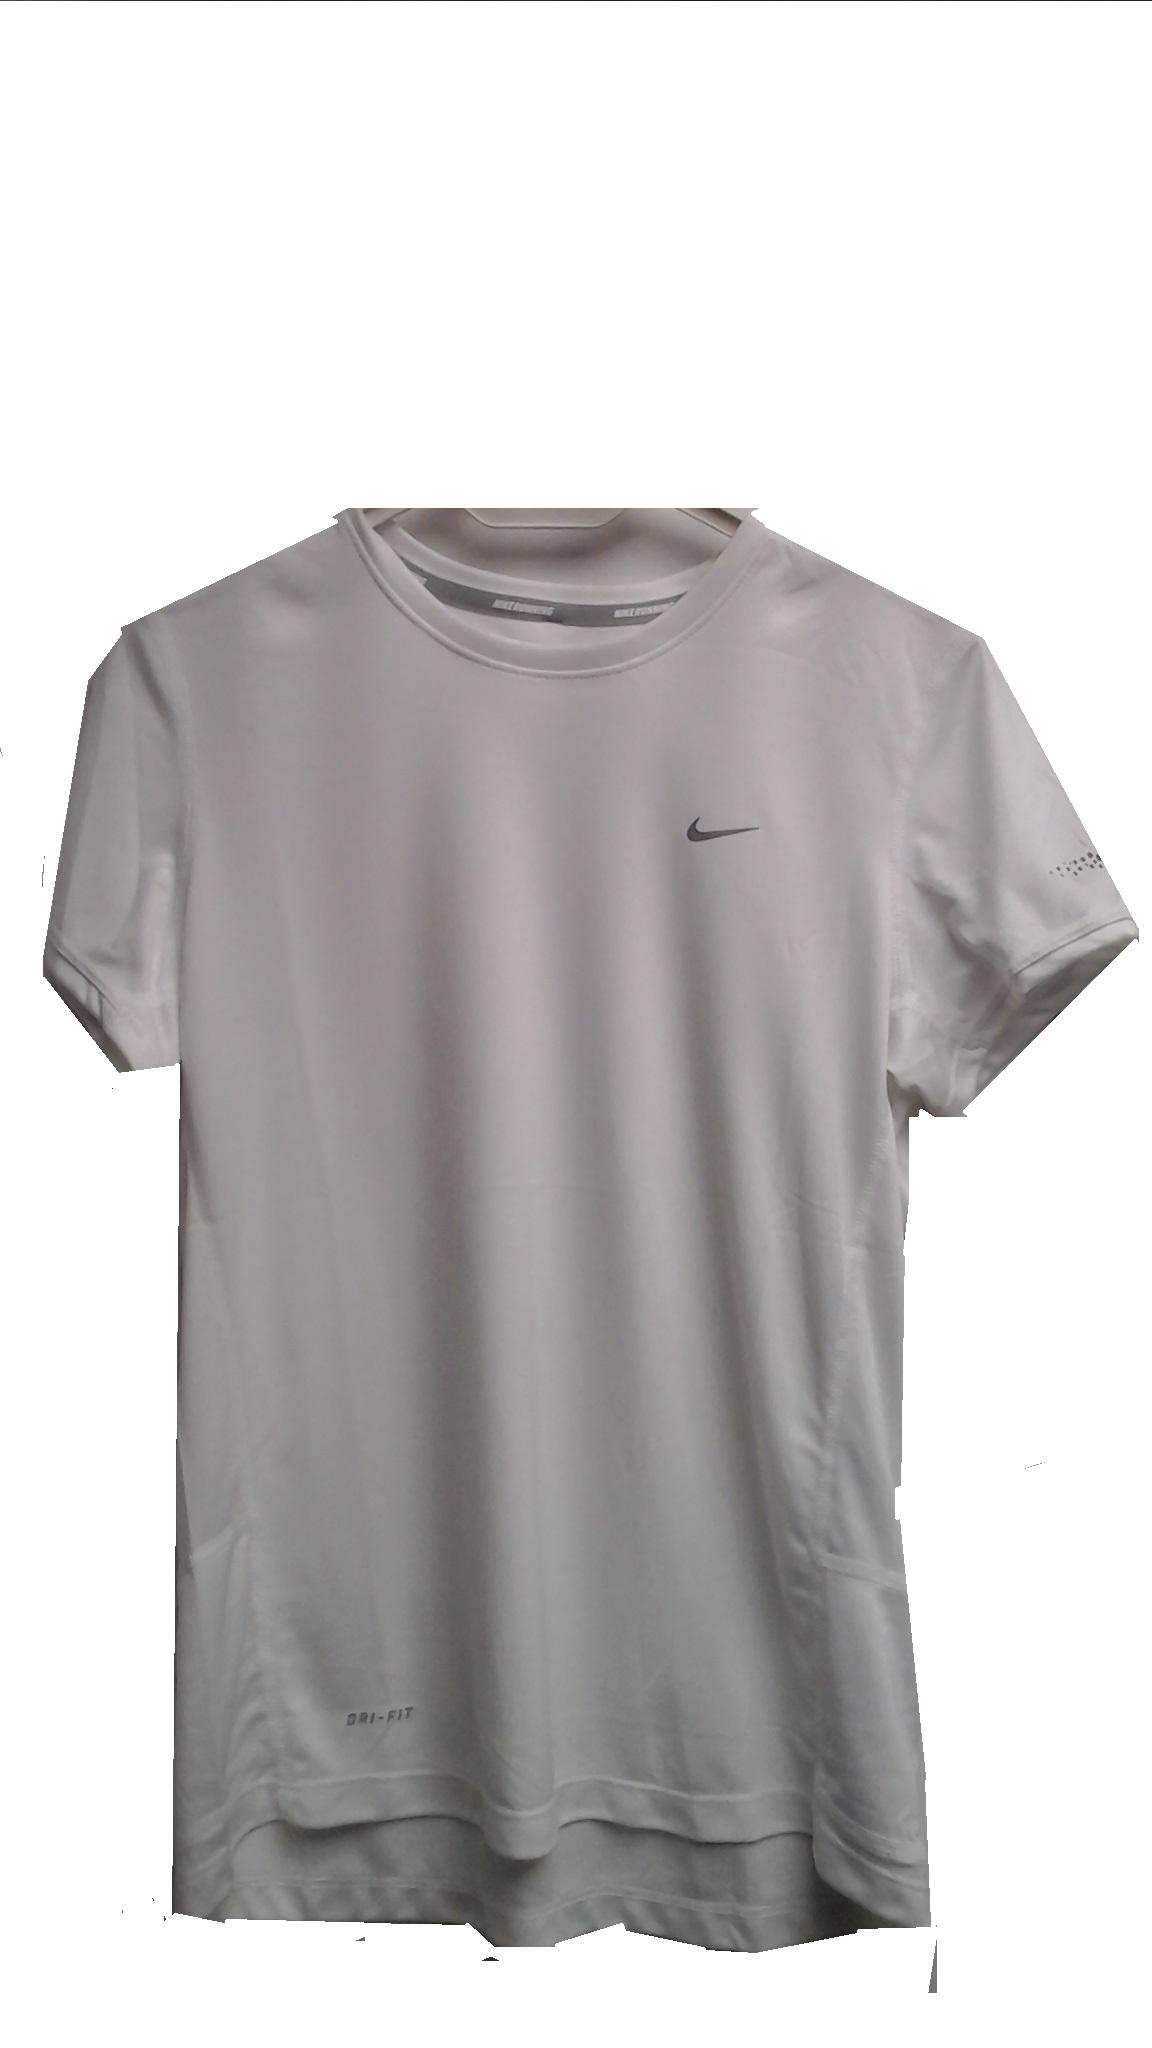 t shirt tennis nike